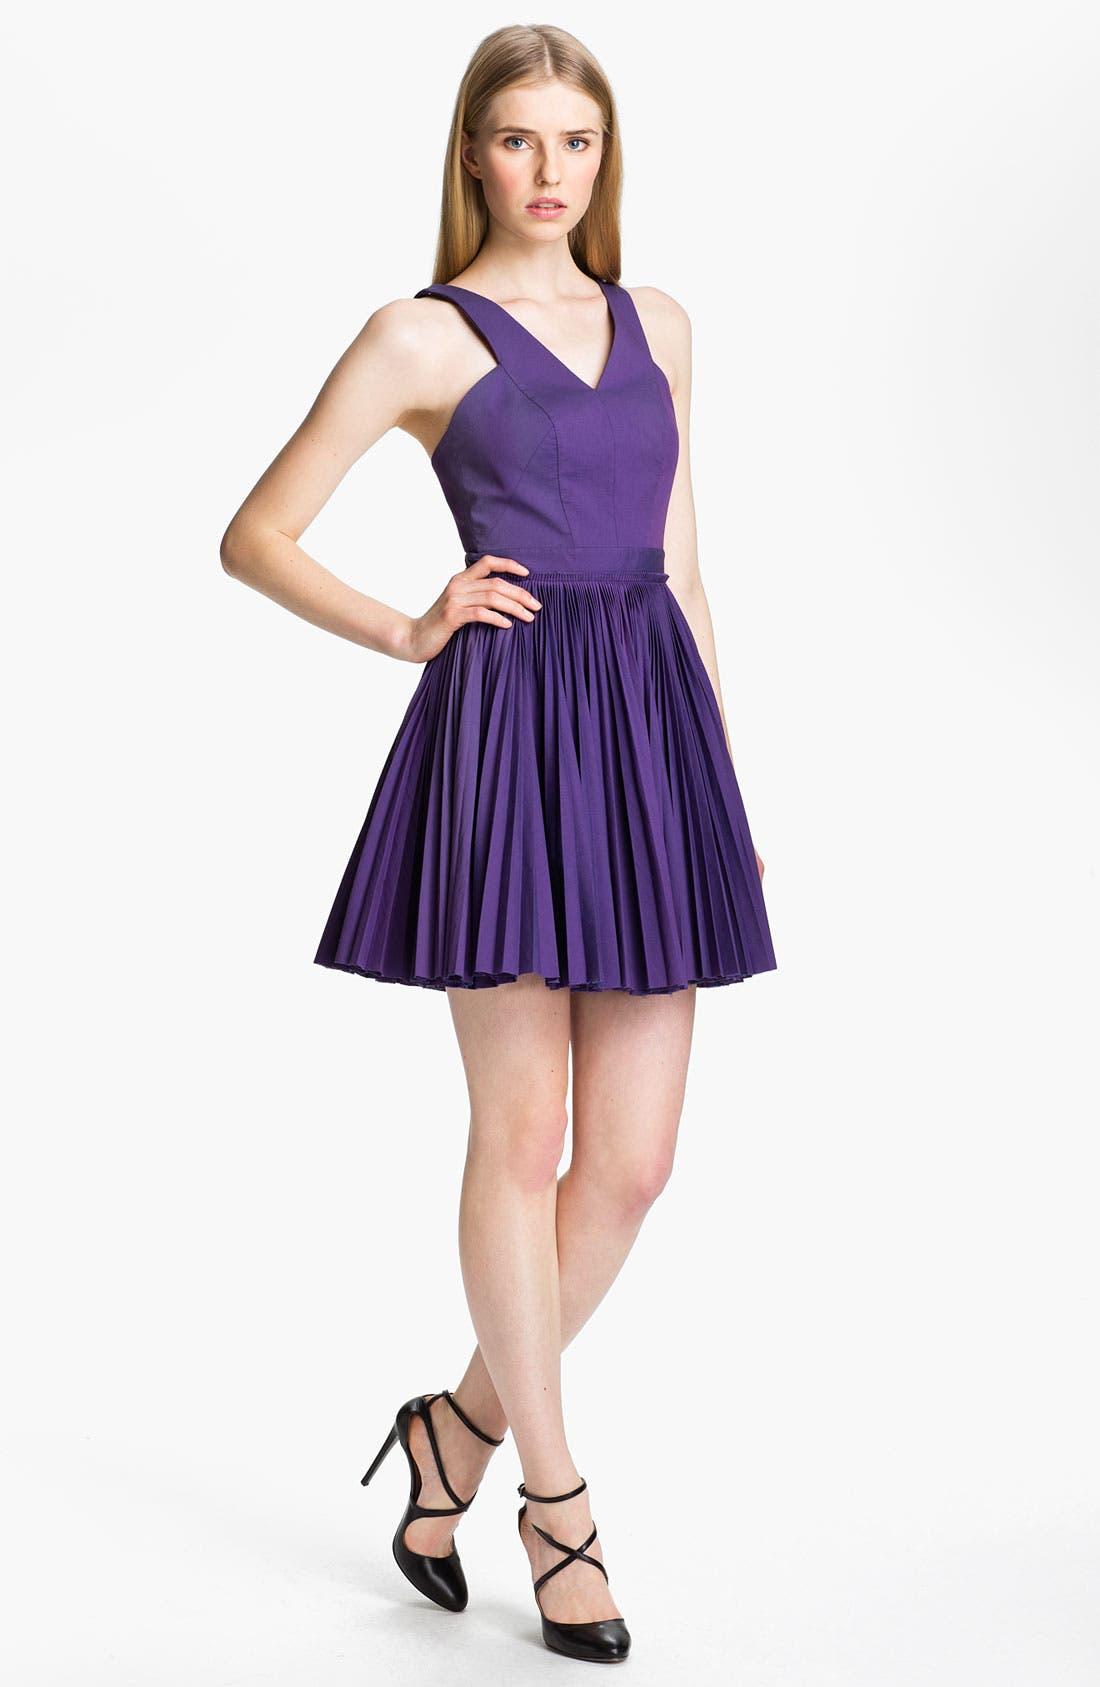 Alternate Image 1 Selected - Robert Rodriguez Cutout & Pleated Dress